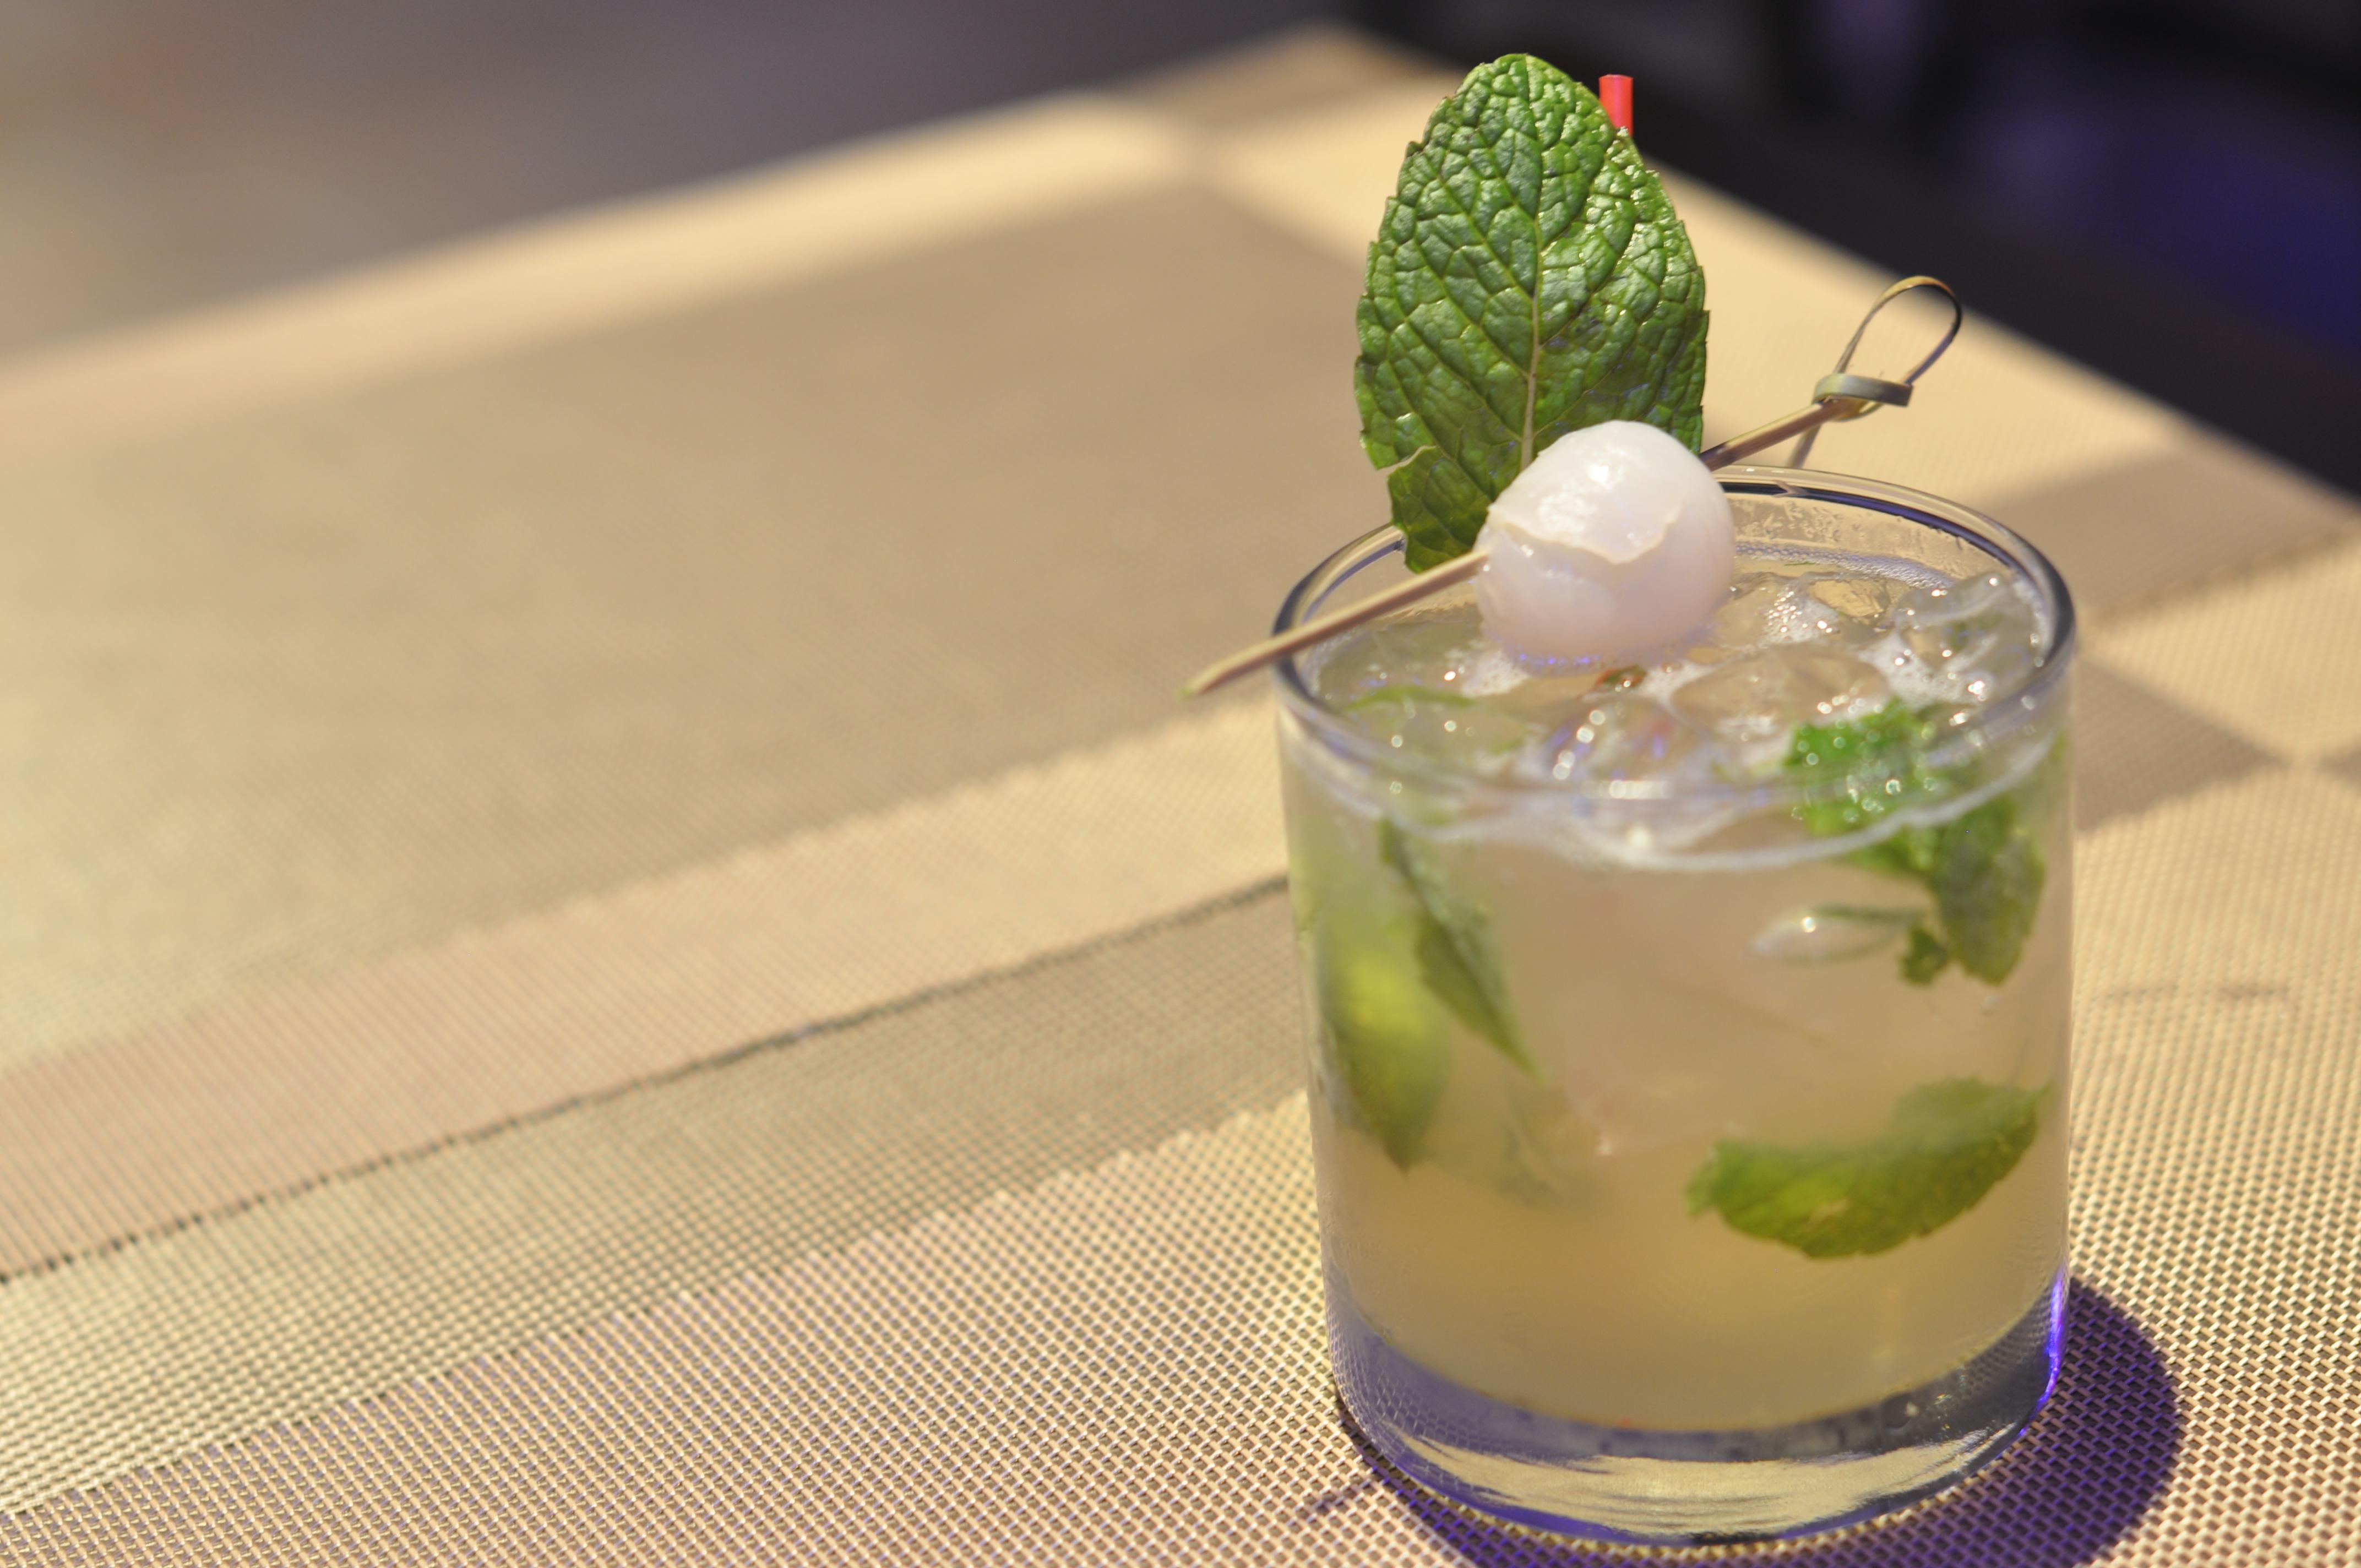 Luna Asian Bistro & Lounge 日本料理 image 23